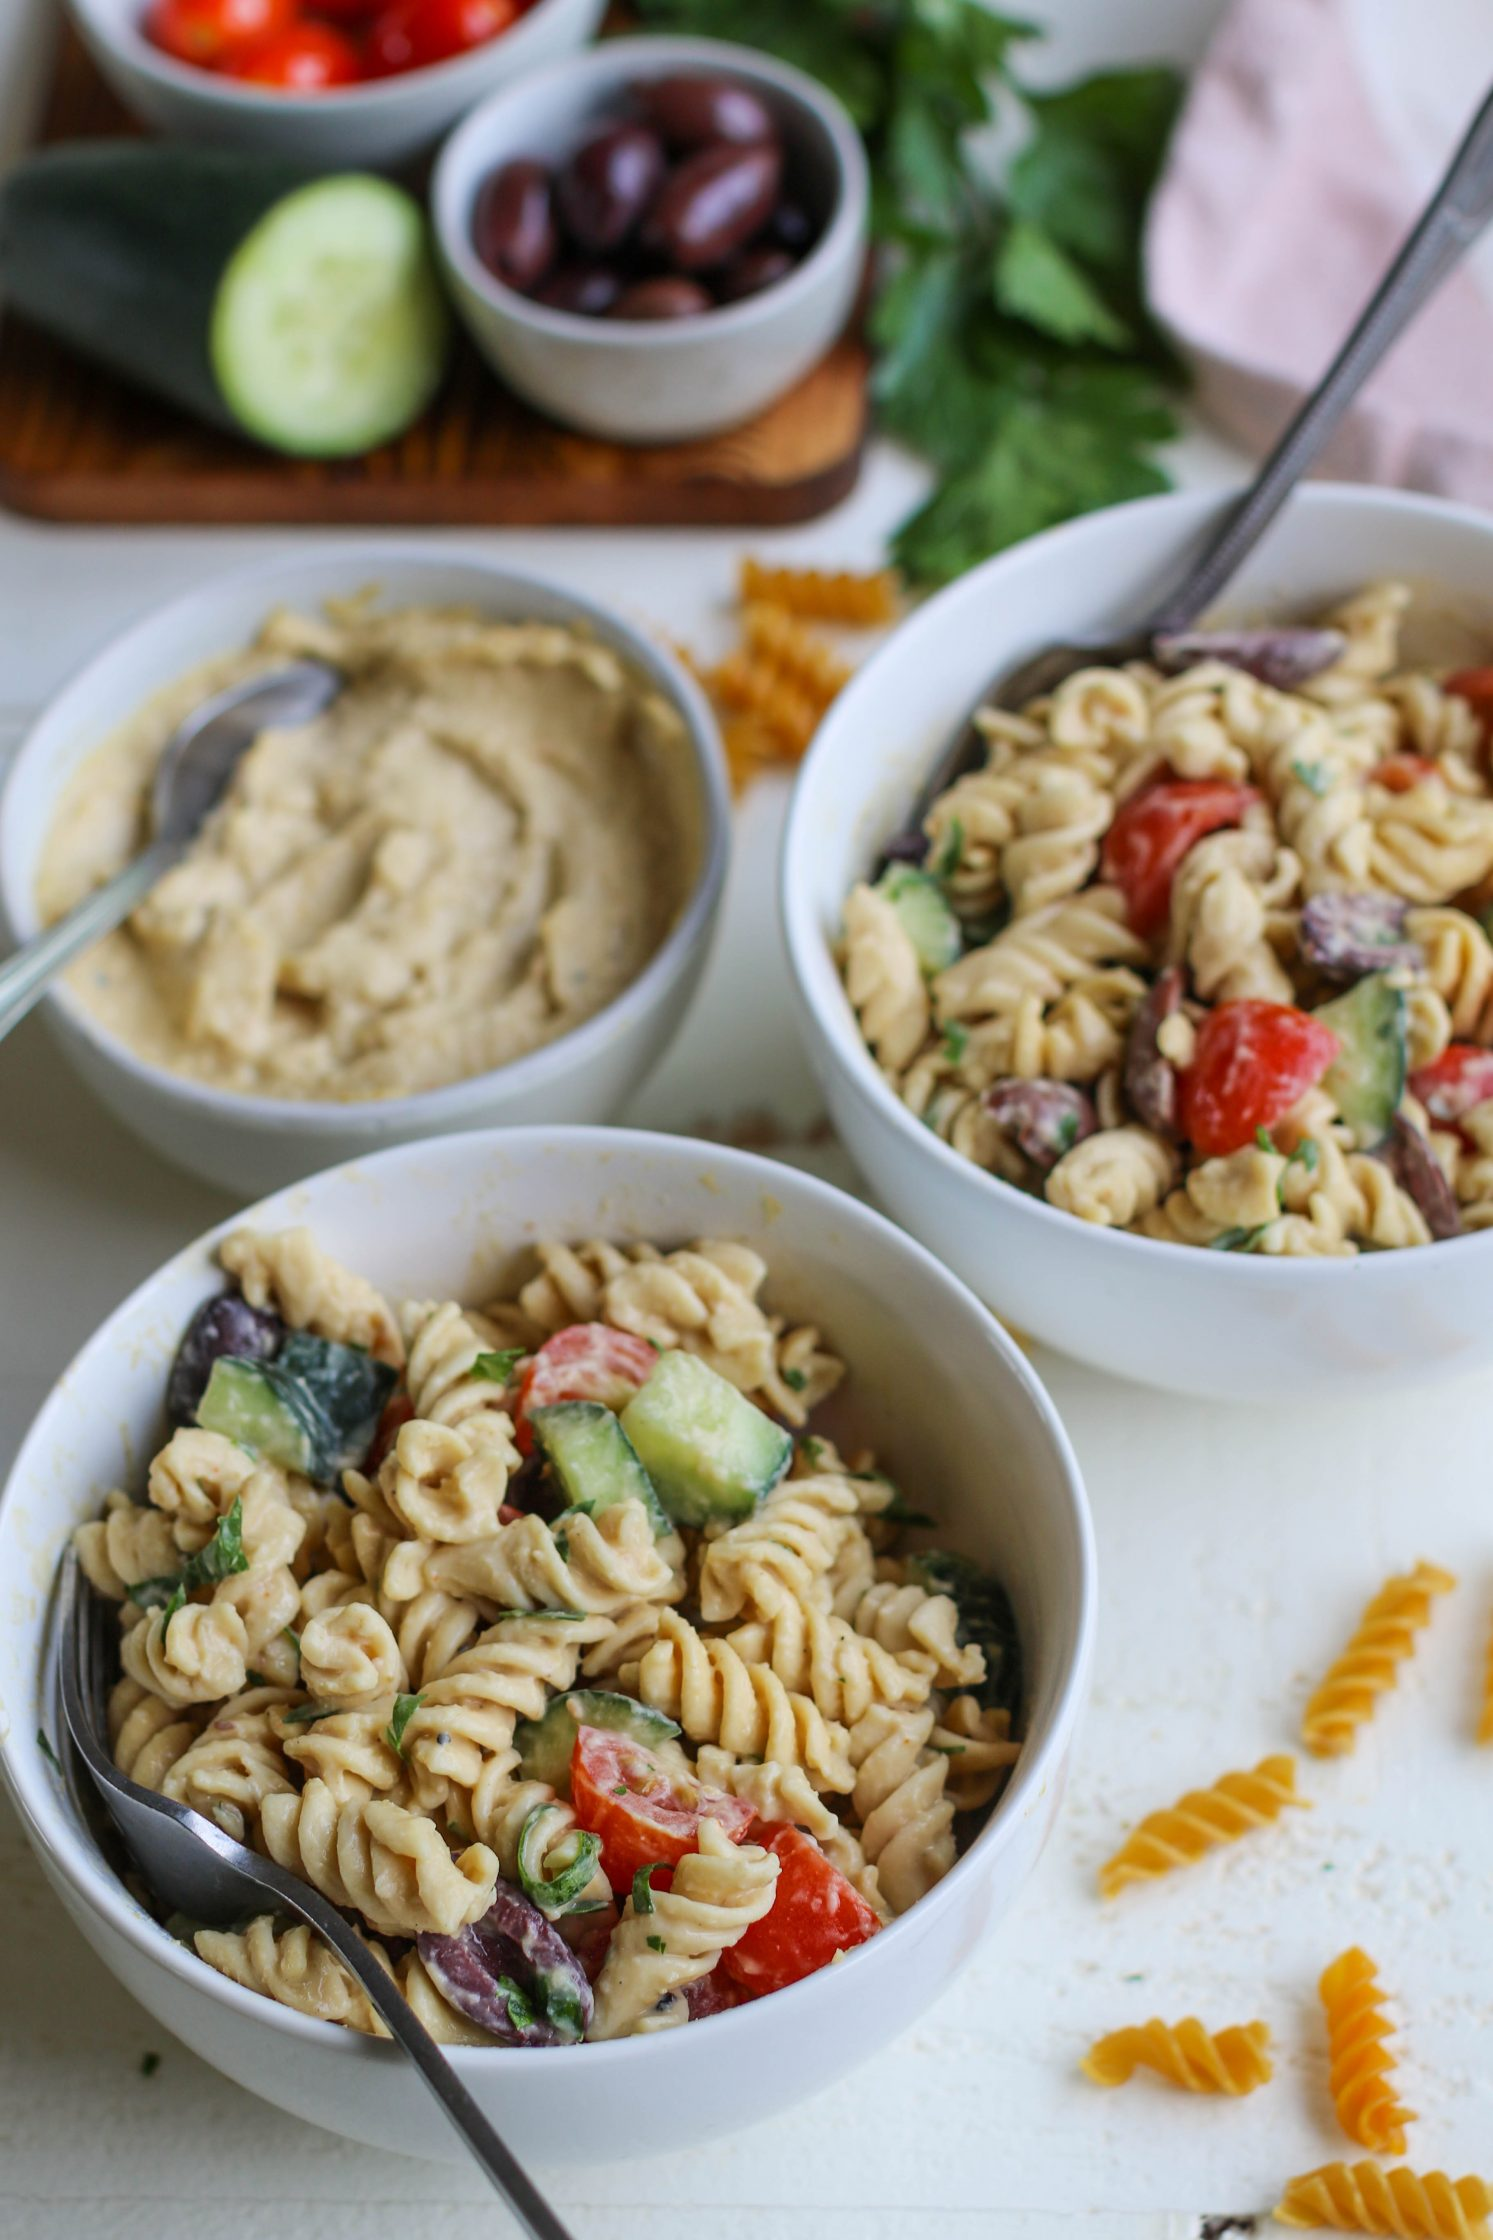 1-Bowl Hummus Pasta Salad by Flora & Vino